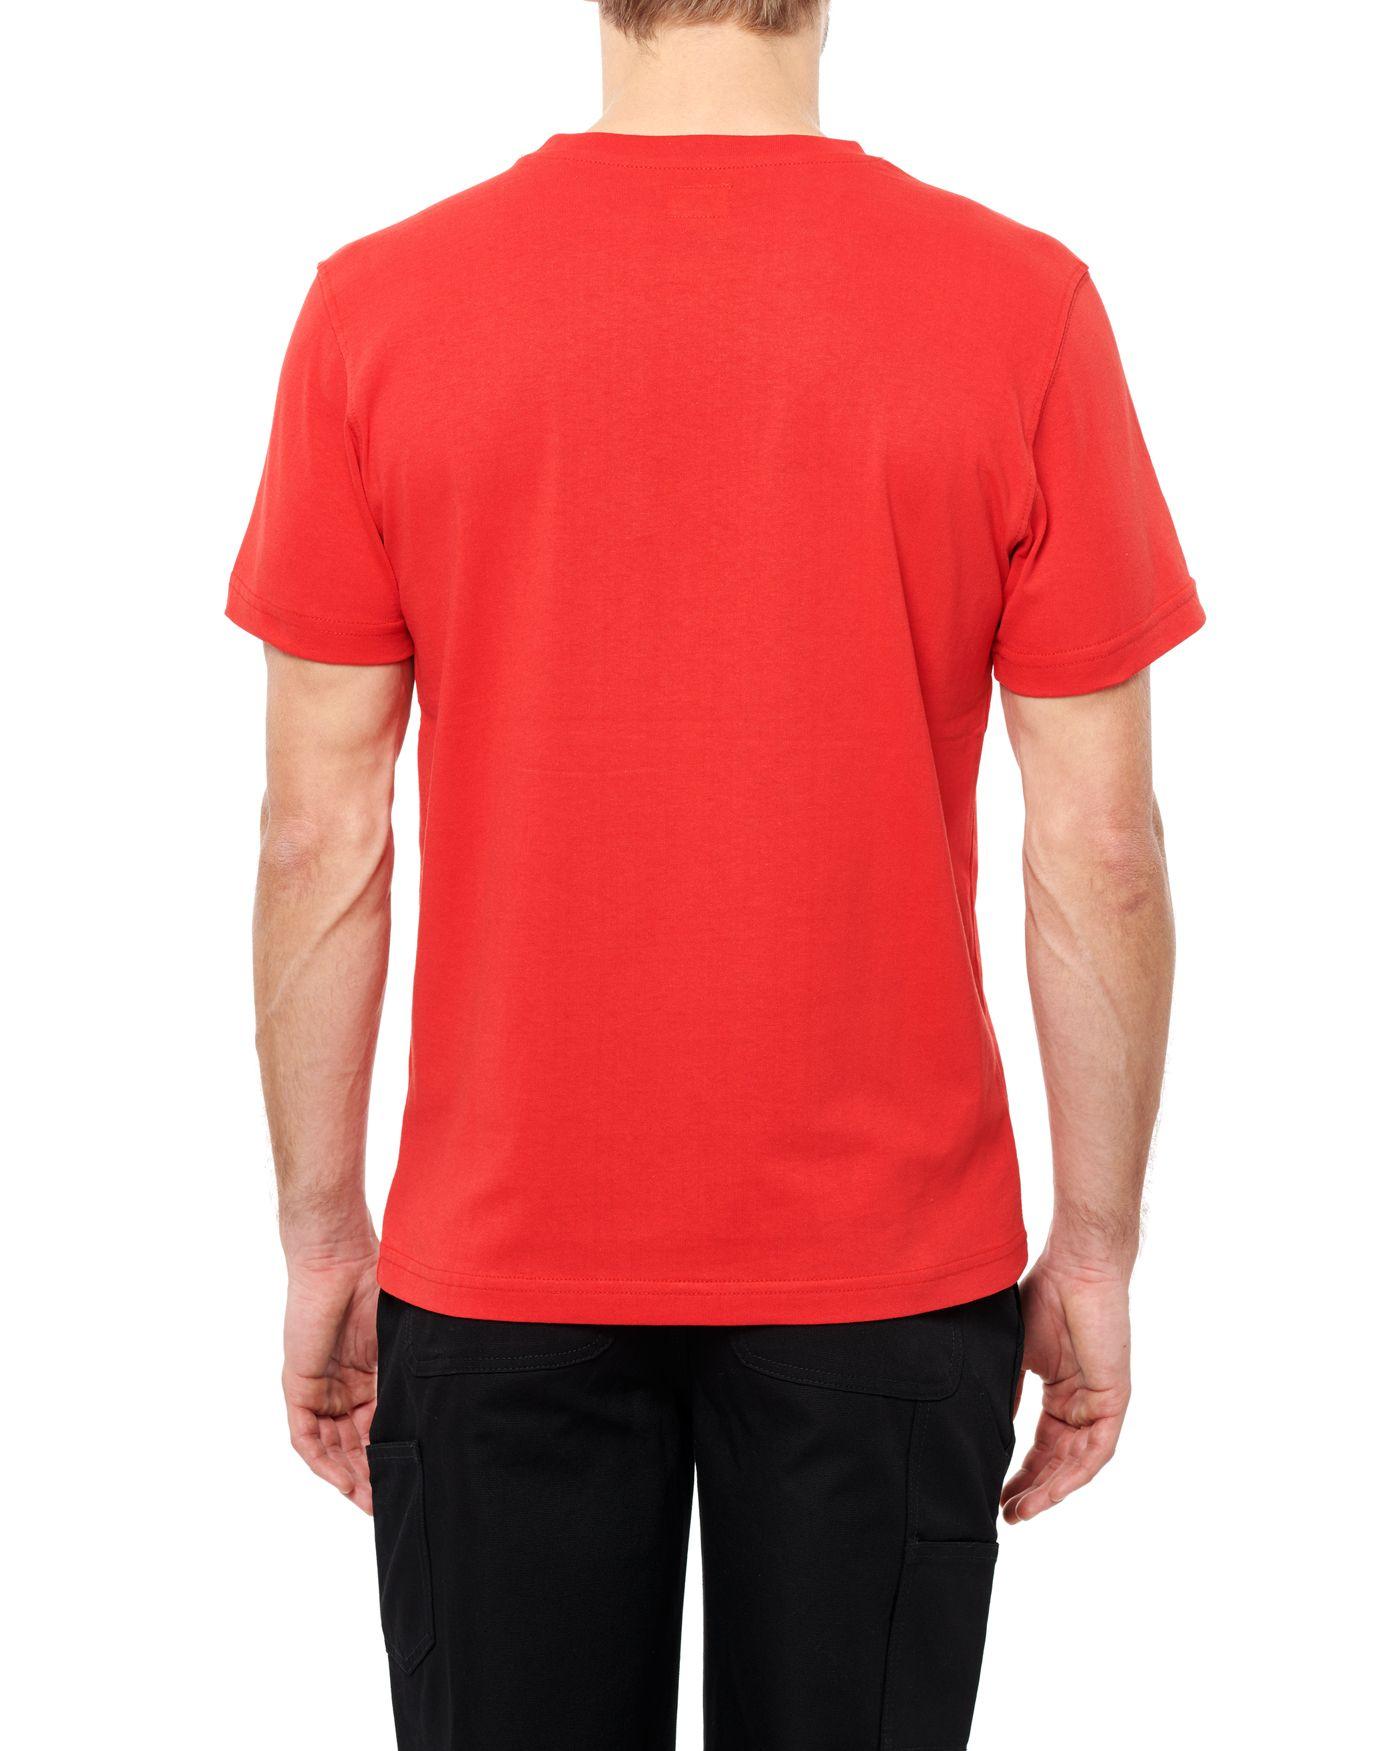 Photo of Retro Wheels S/S T-shirt, Red